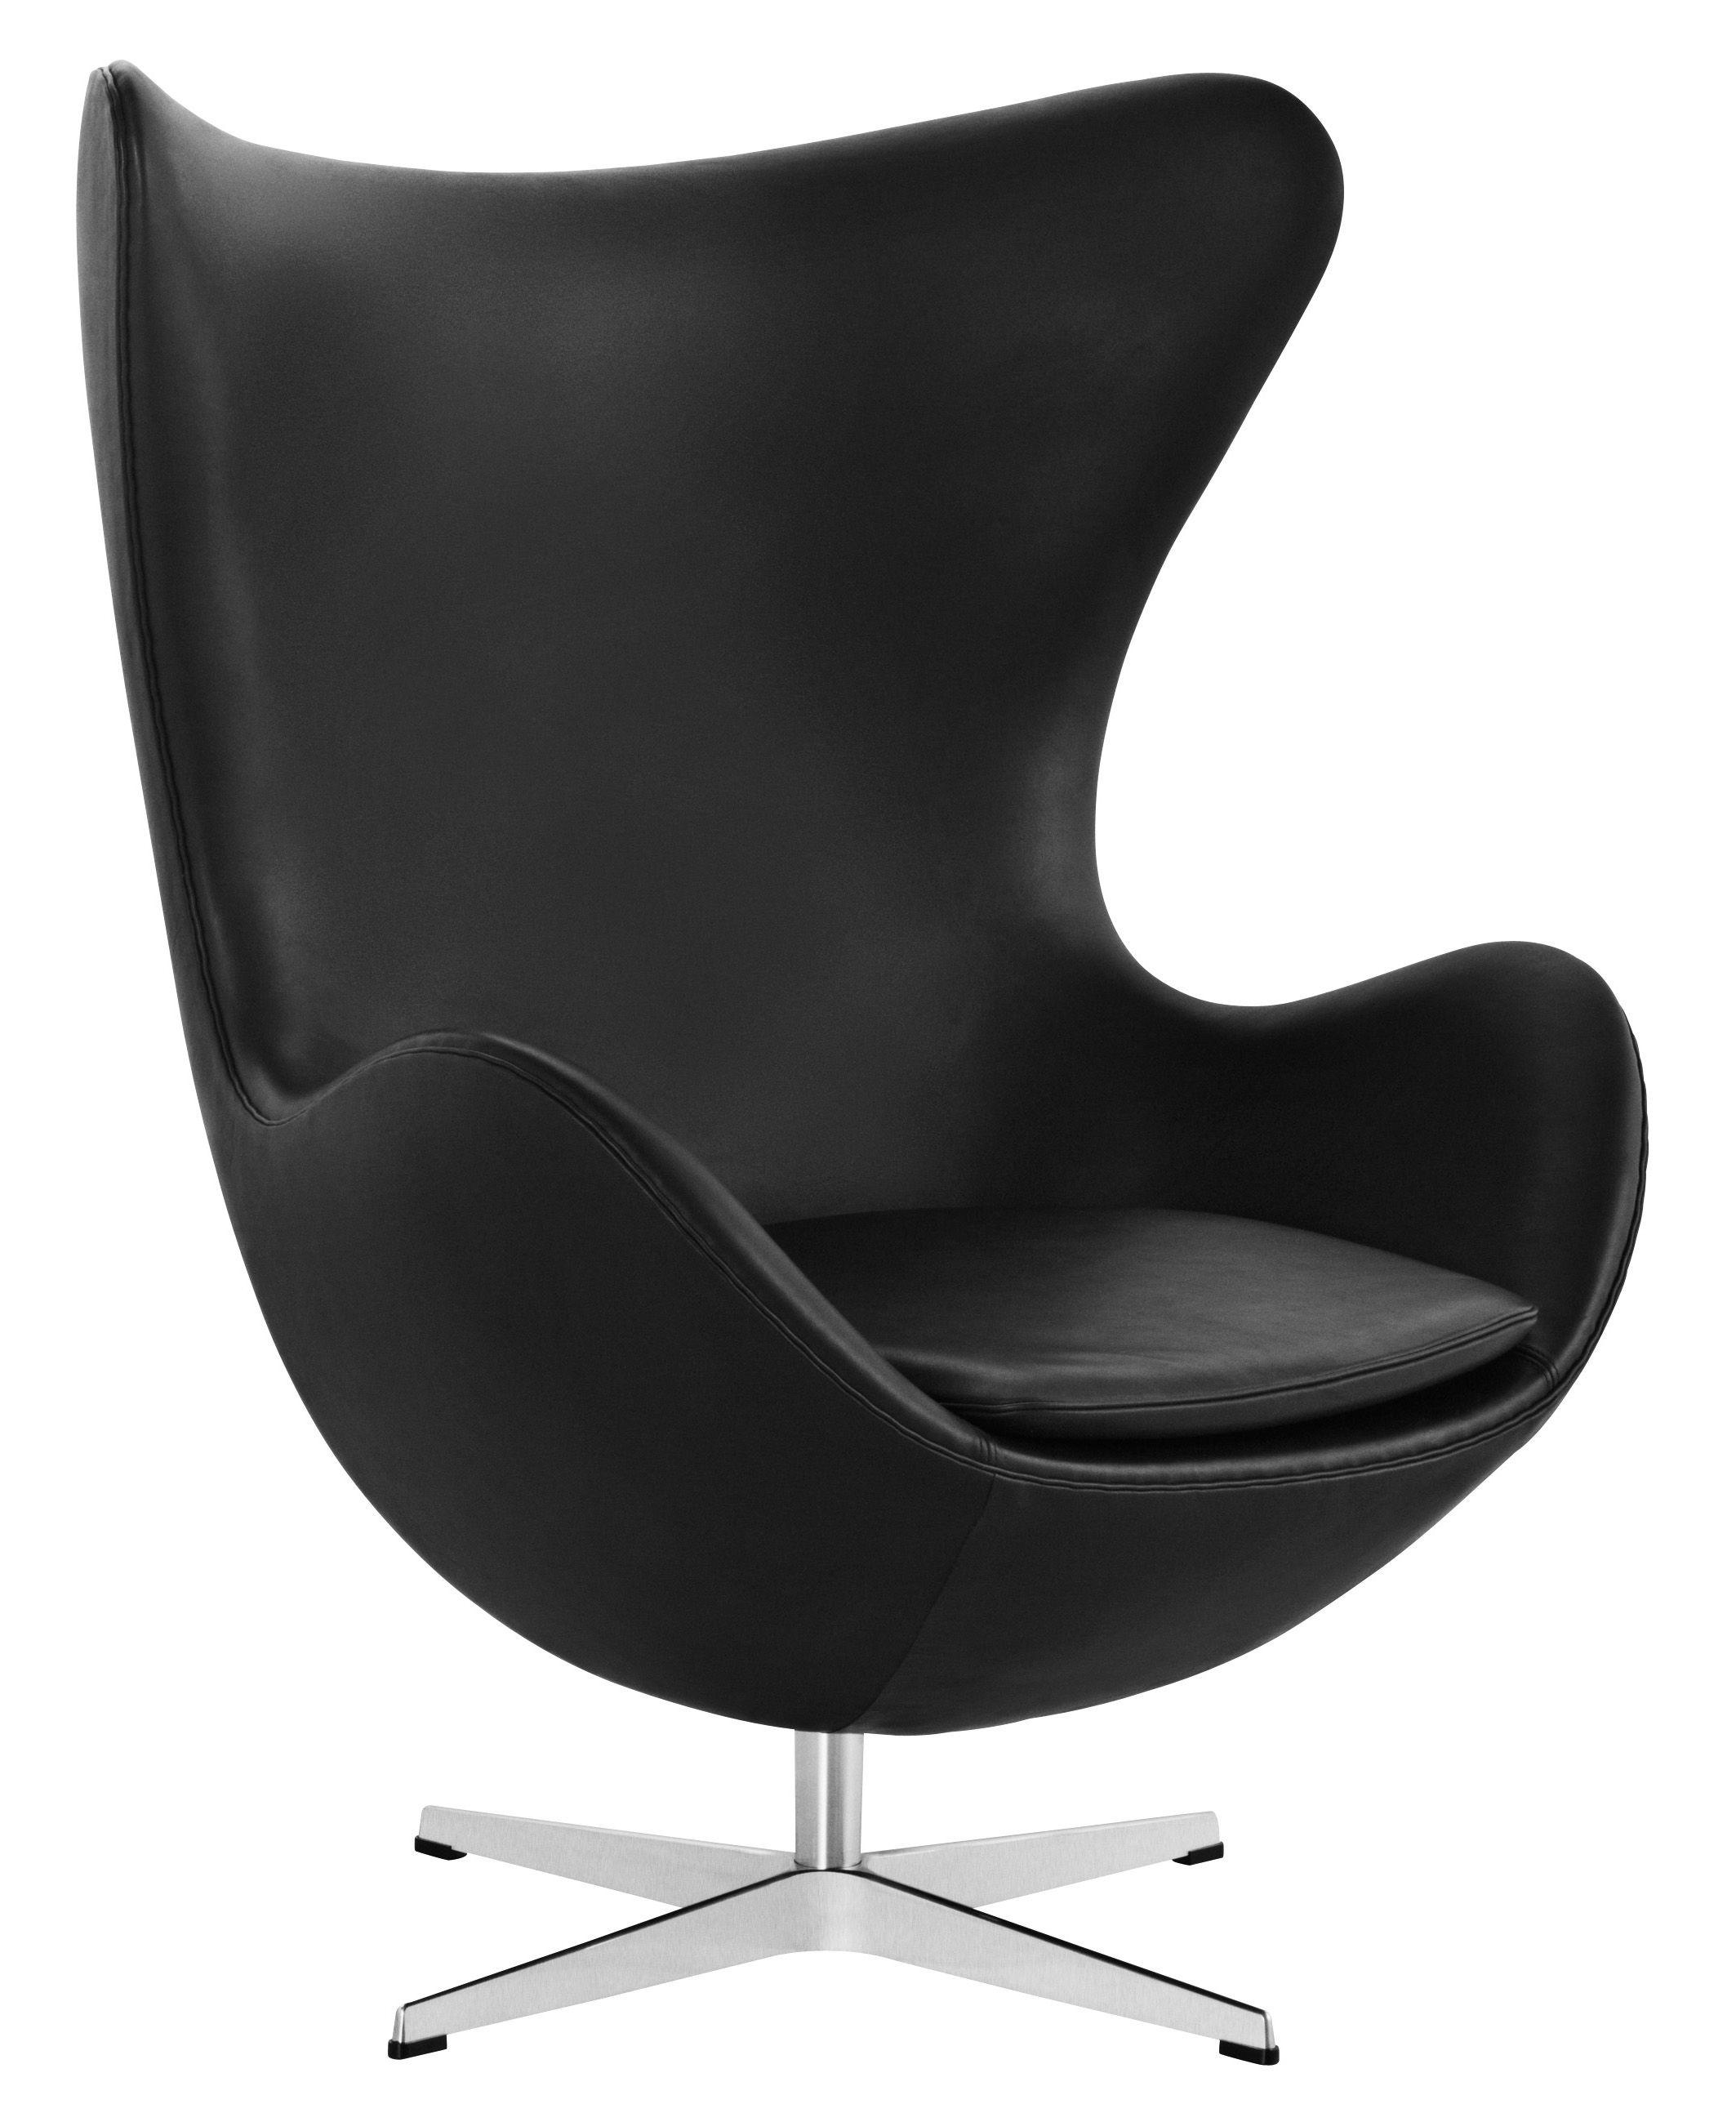 Hochwertig ... Möbel   Lounge Sessel   Egg Chair Drehsessel Leder   Fritz Hansen    Schwarzes Leder